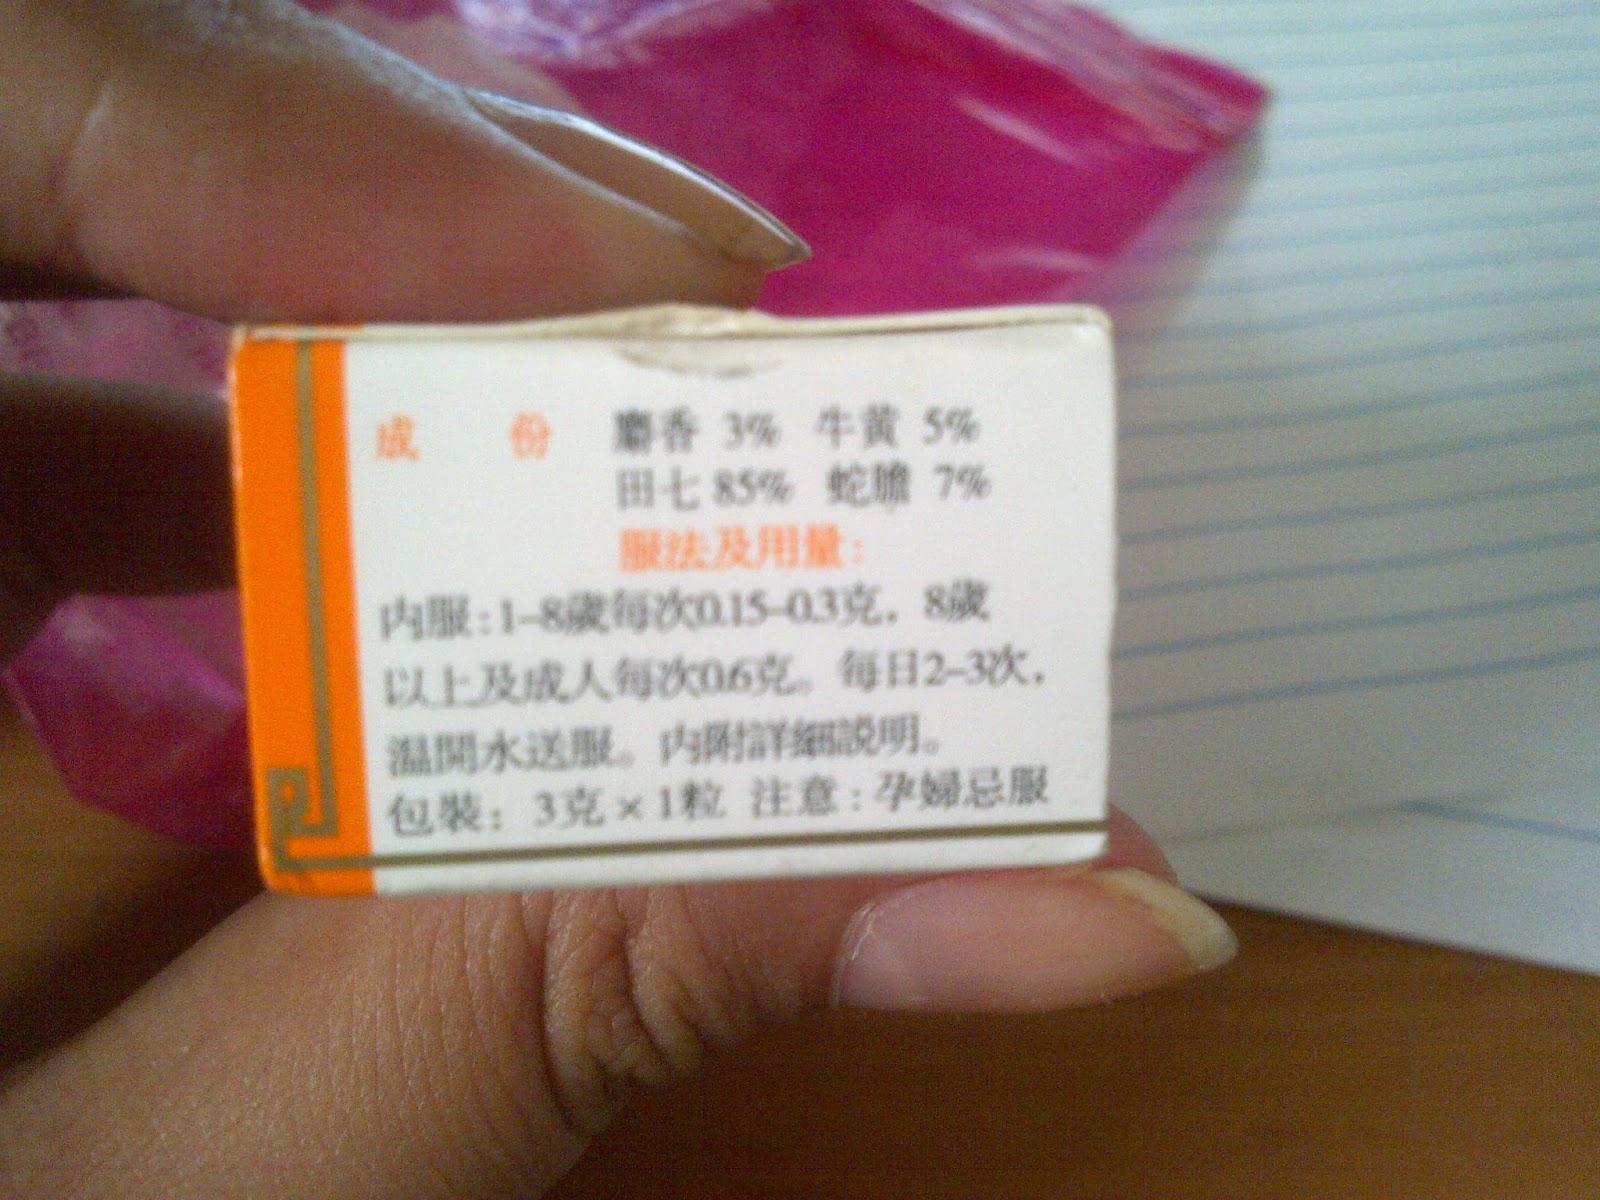 Jual Obat Pasca Operasi Pien Tze Huang Zhang Zhou Ini Penampakannya